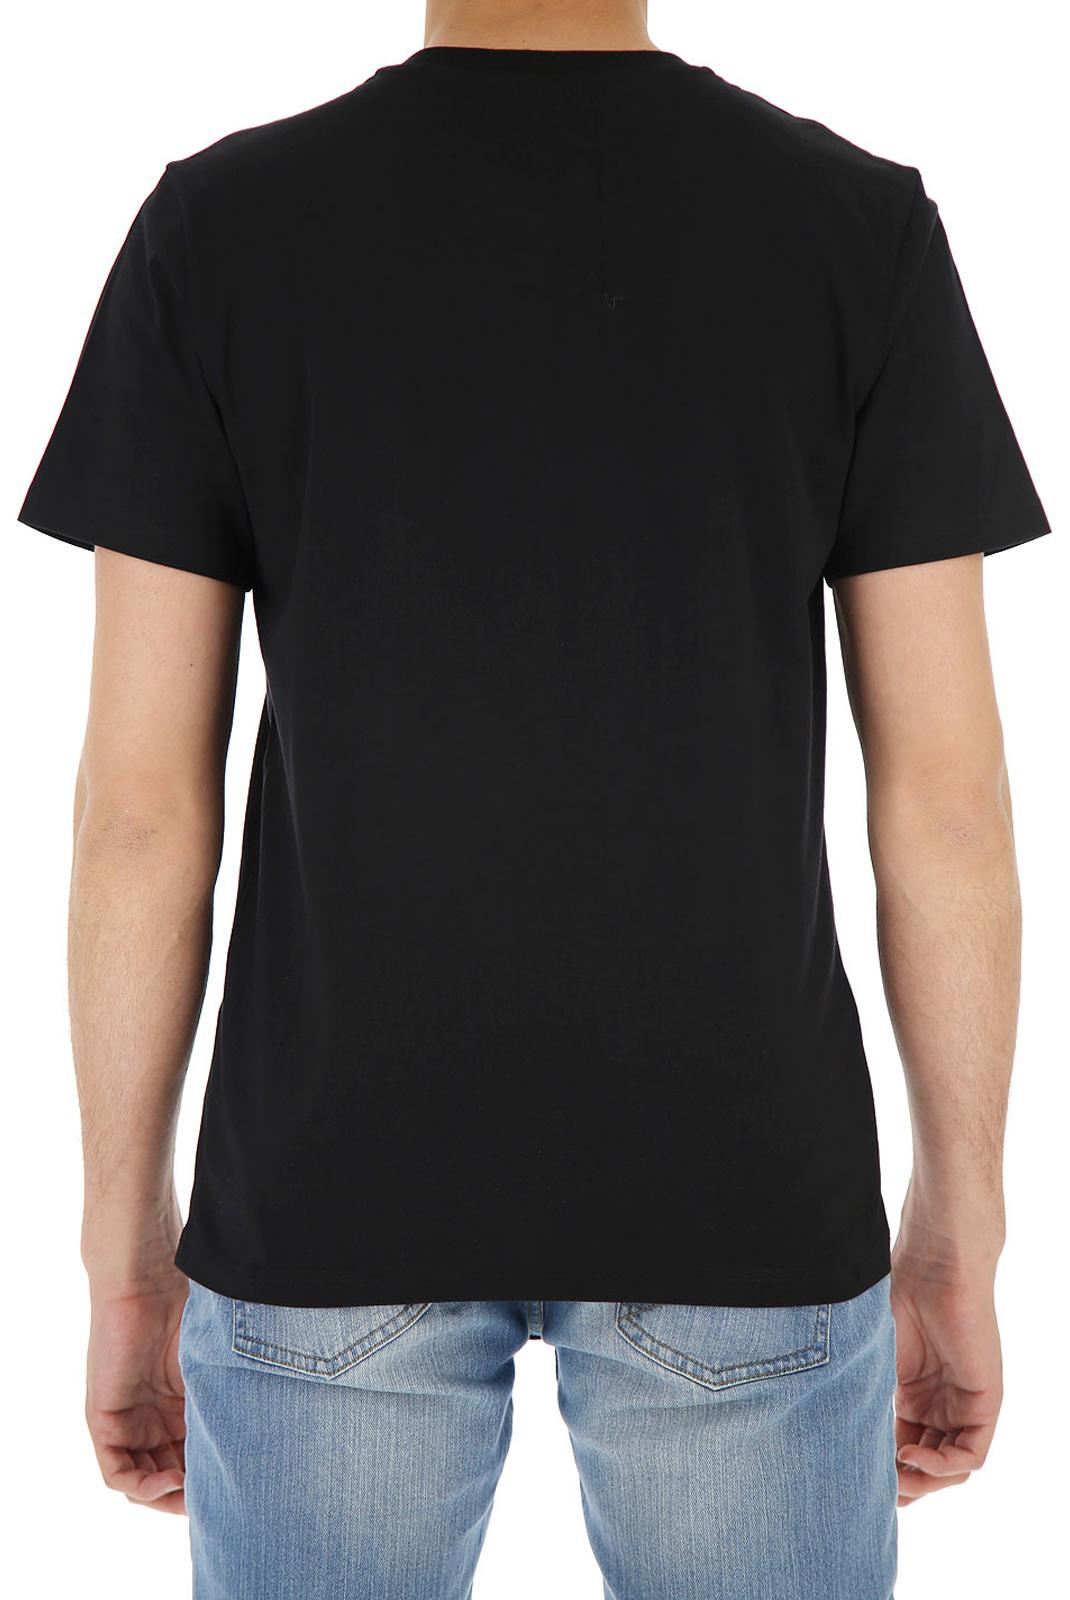 Tee-shirts  Moschino ZJ0707 BLACK